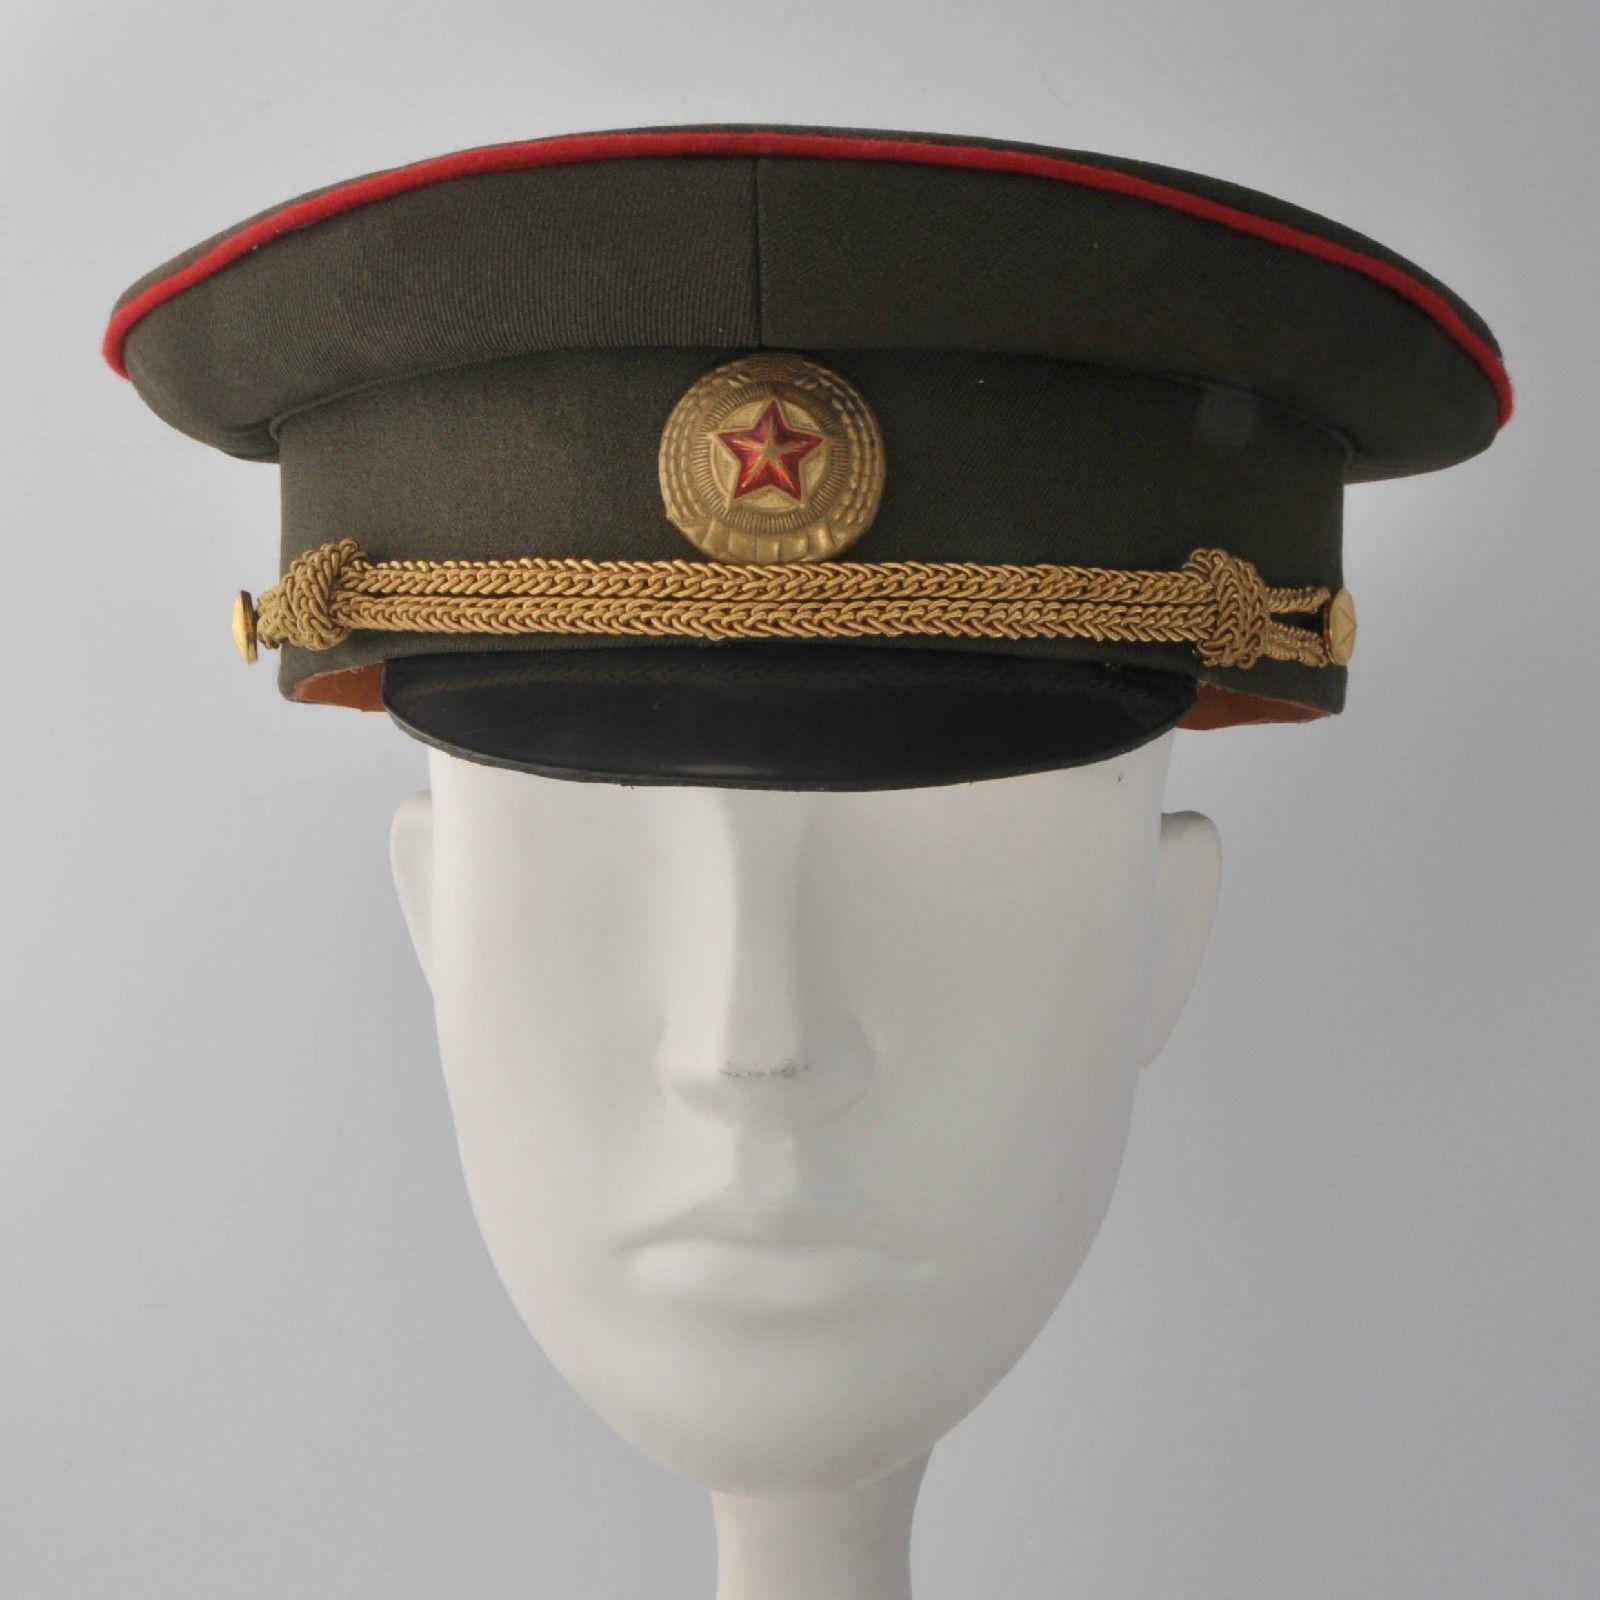 Replica Ww Tsarist Russia Army Summer Warp Tunic Jacket Ebay North Korea Visor Replicas